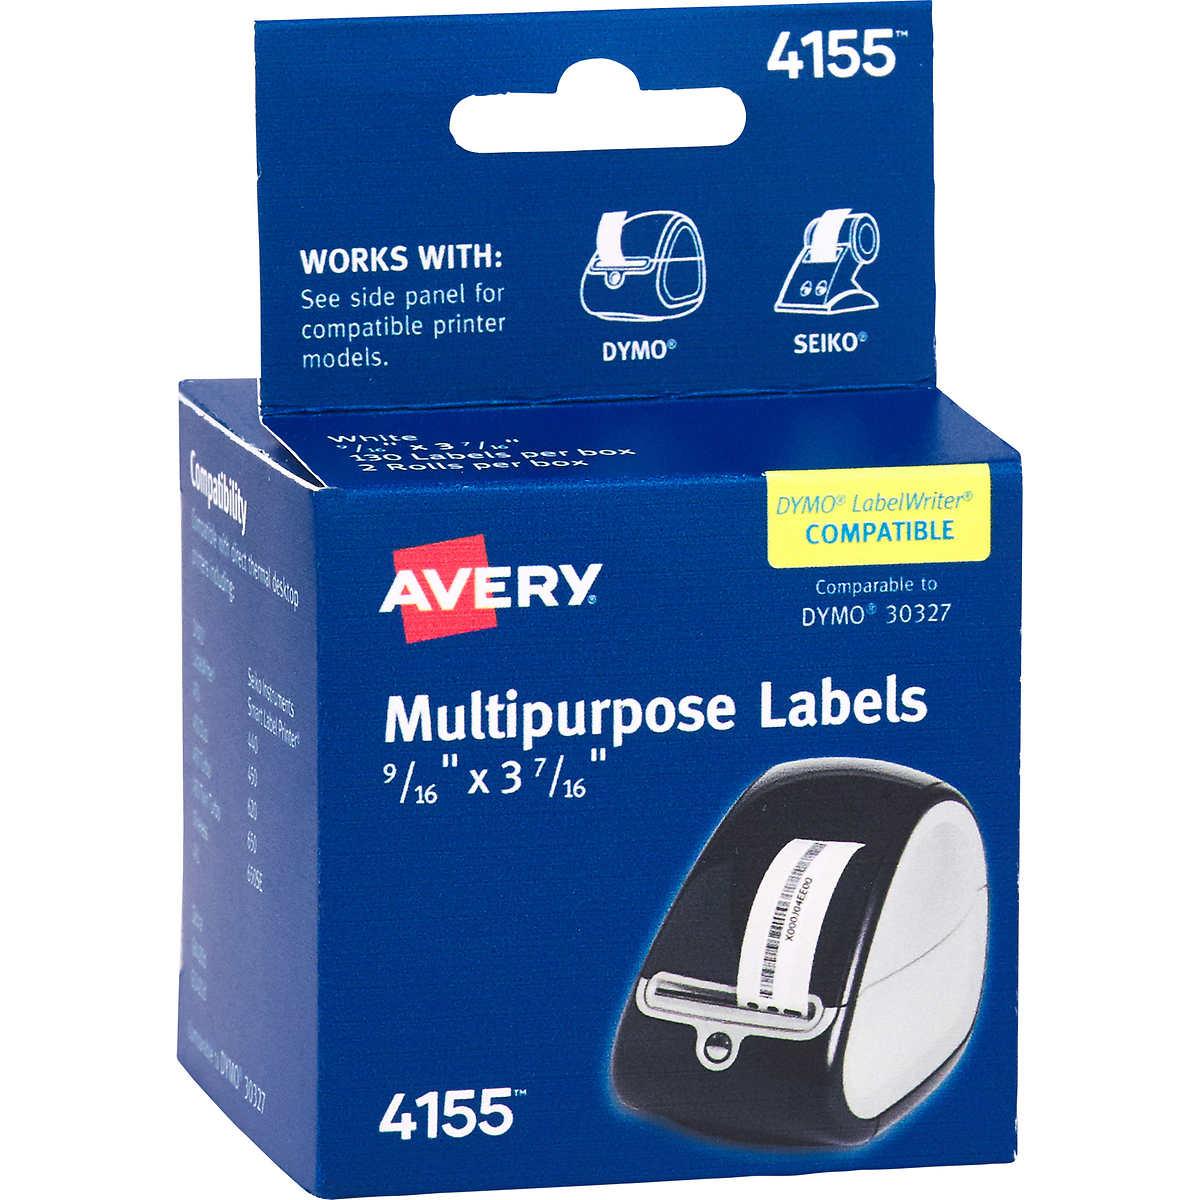 Avery Thermal Printer Labels, 1/3 Cut File Folder, White, 260 ct